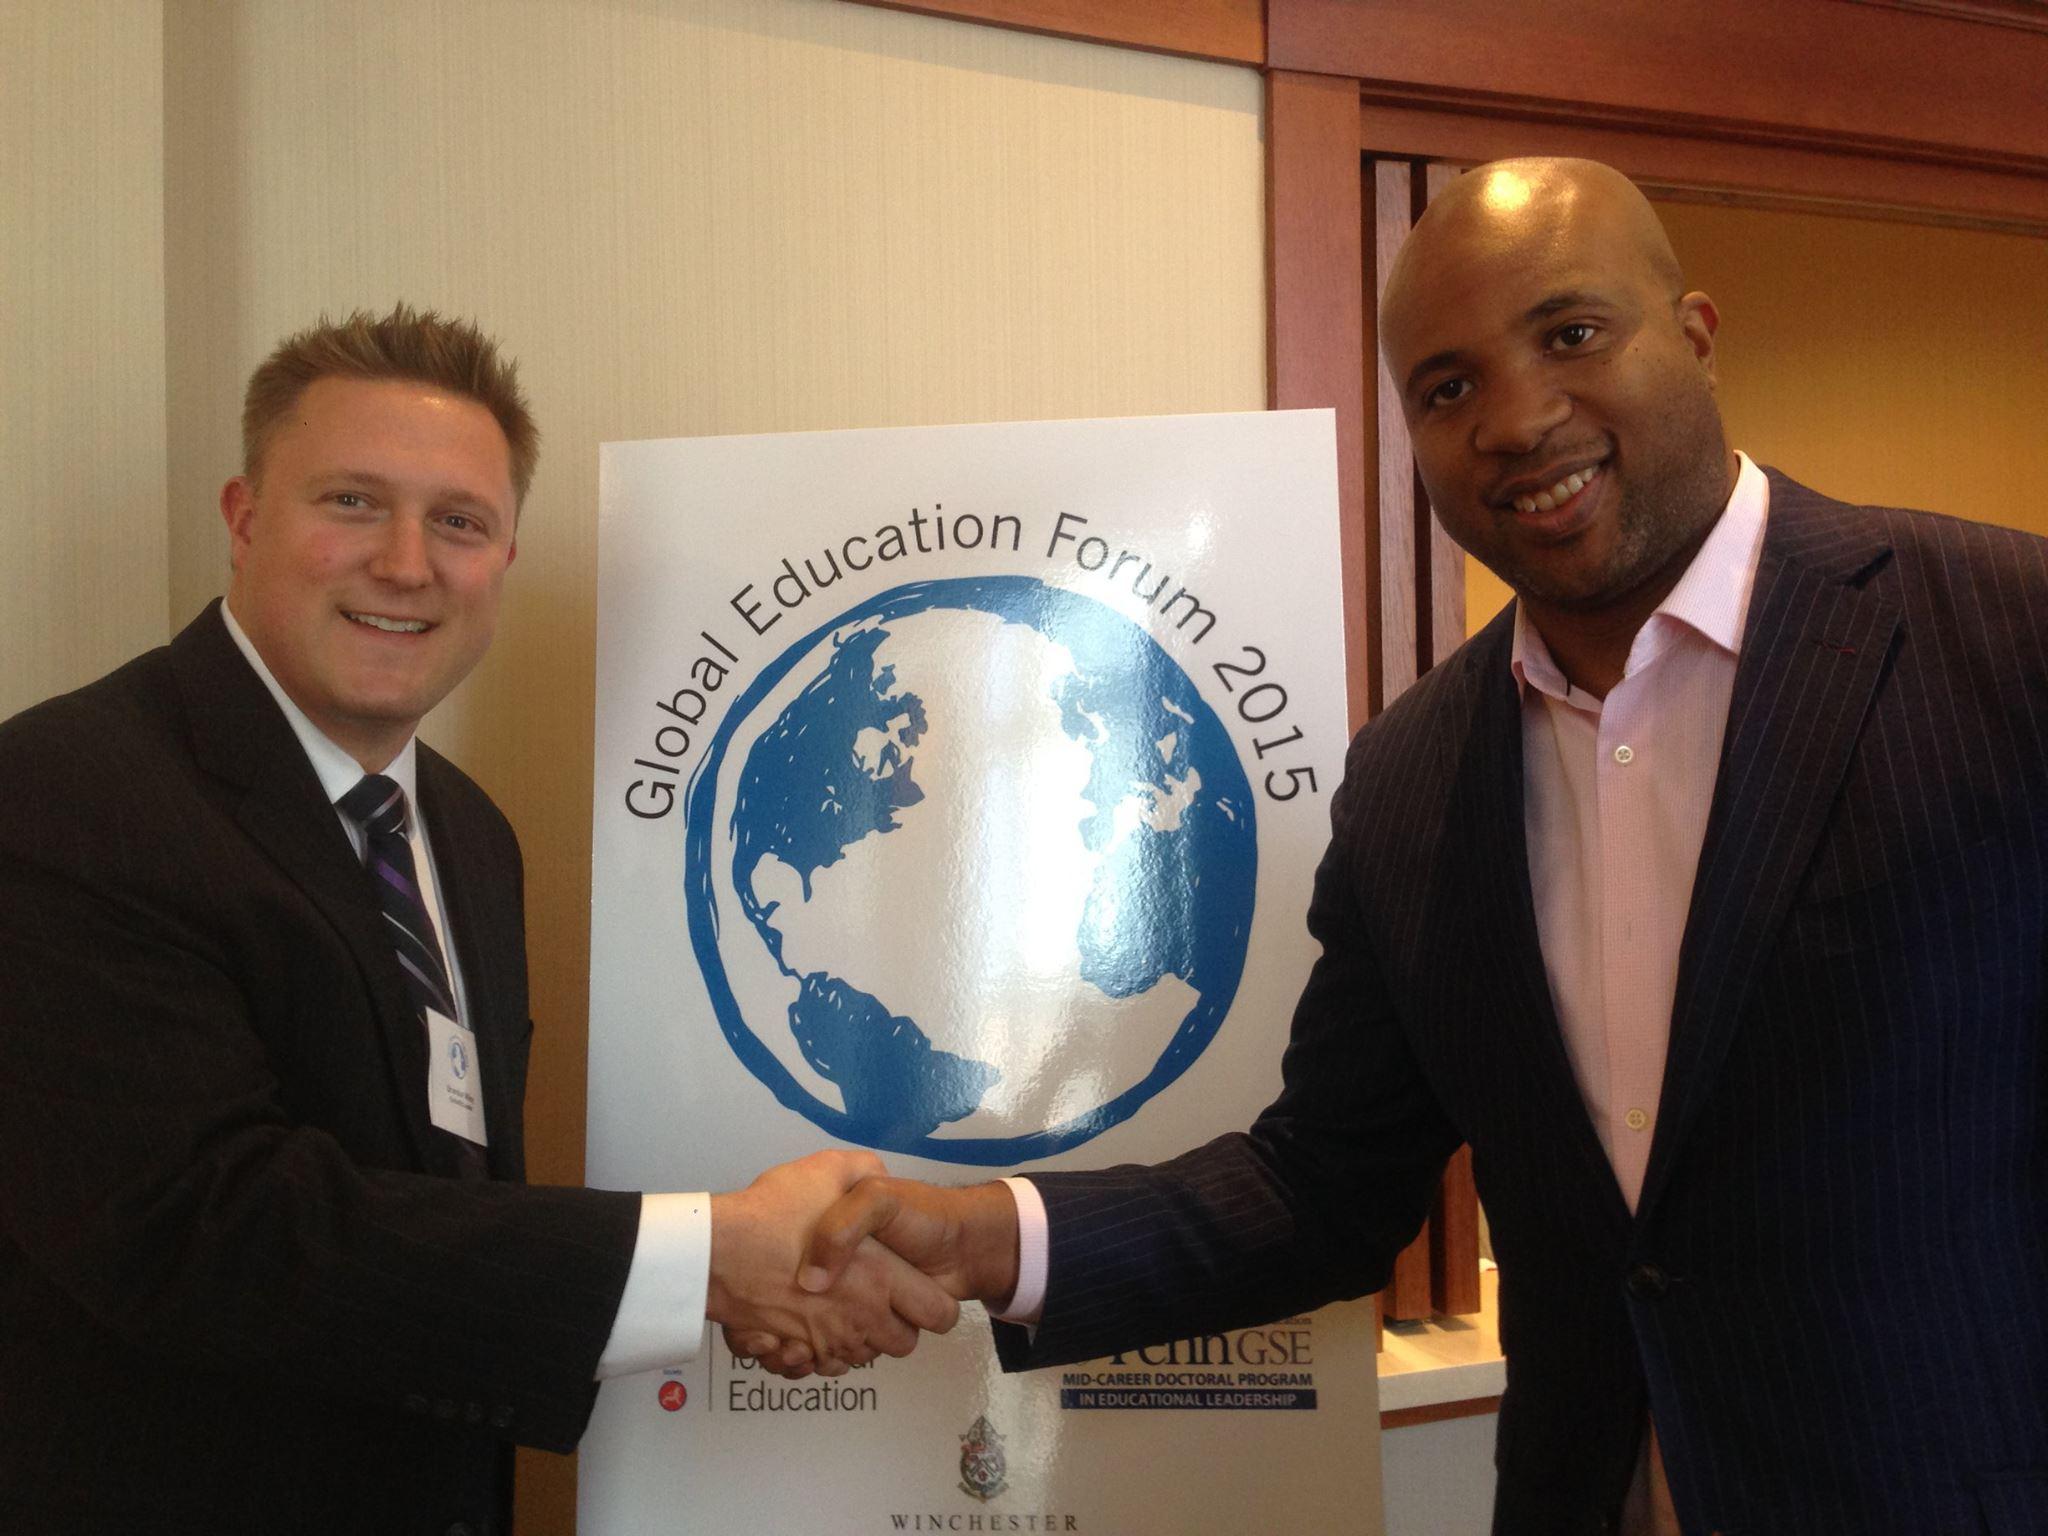 Congratulatory handshake with Dr. Brandon Wiley, former Executive Director of Asia Society